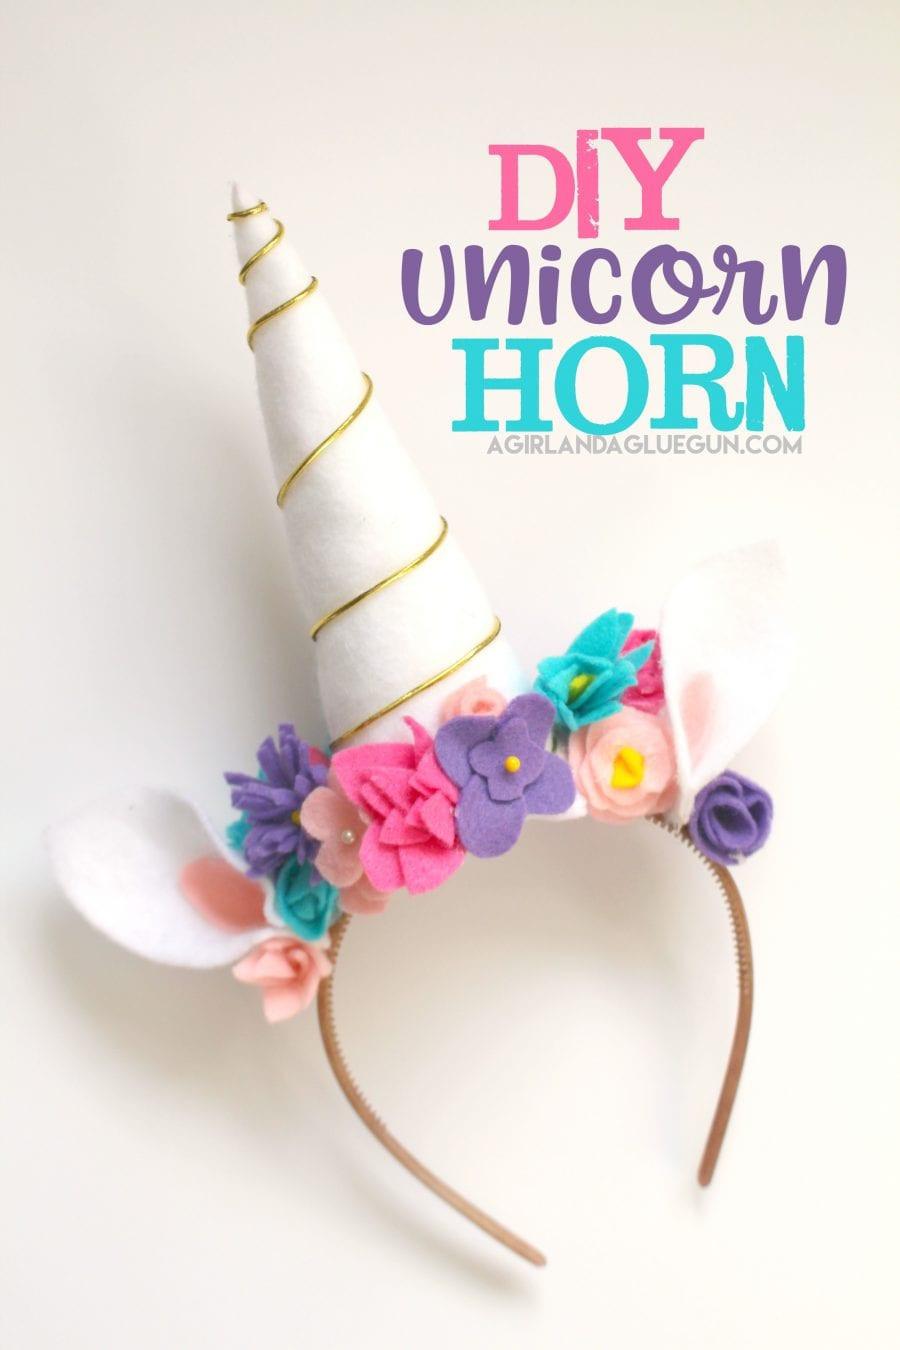 Unicorn Diy  Unicorn costume DIY A girl and a glue gun